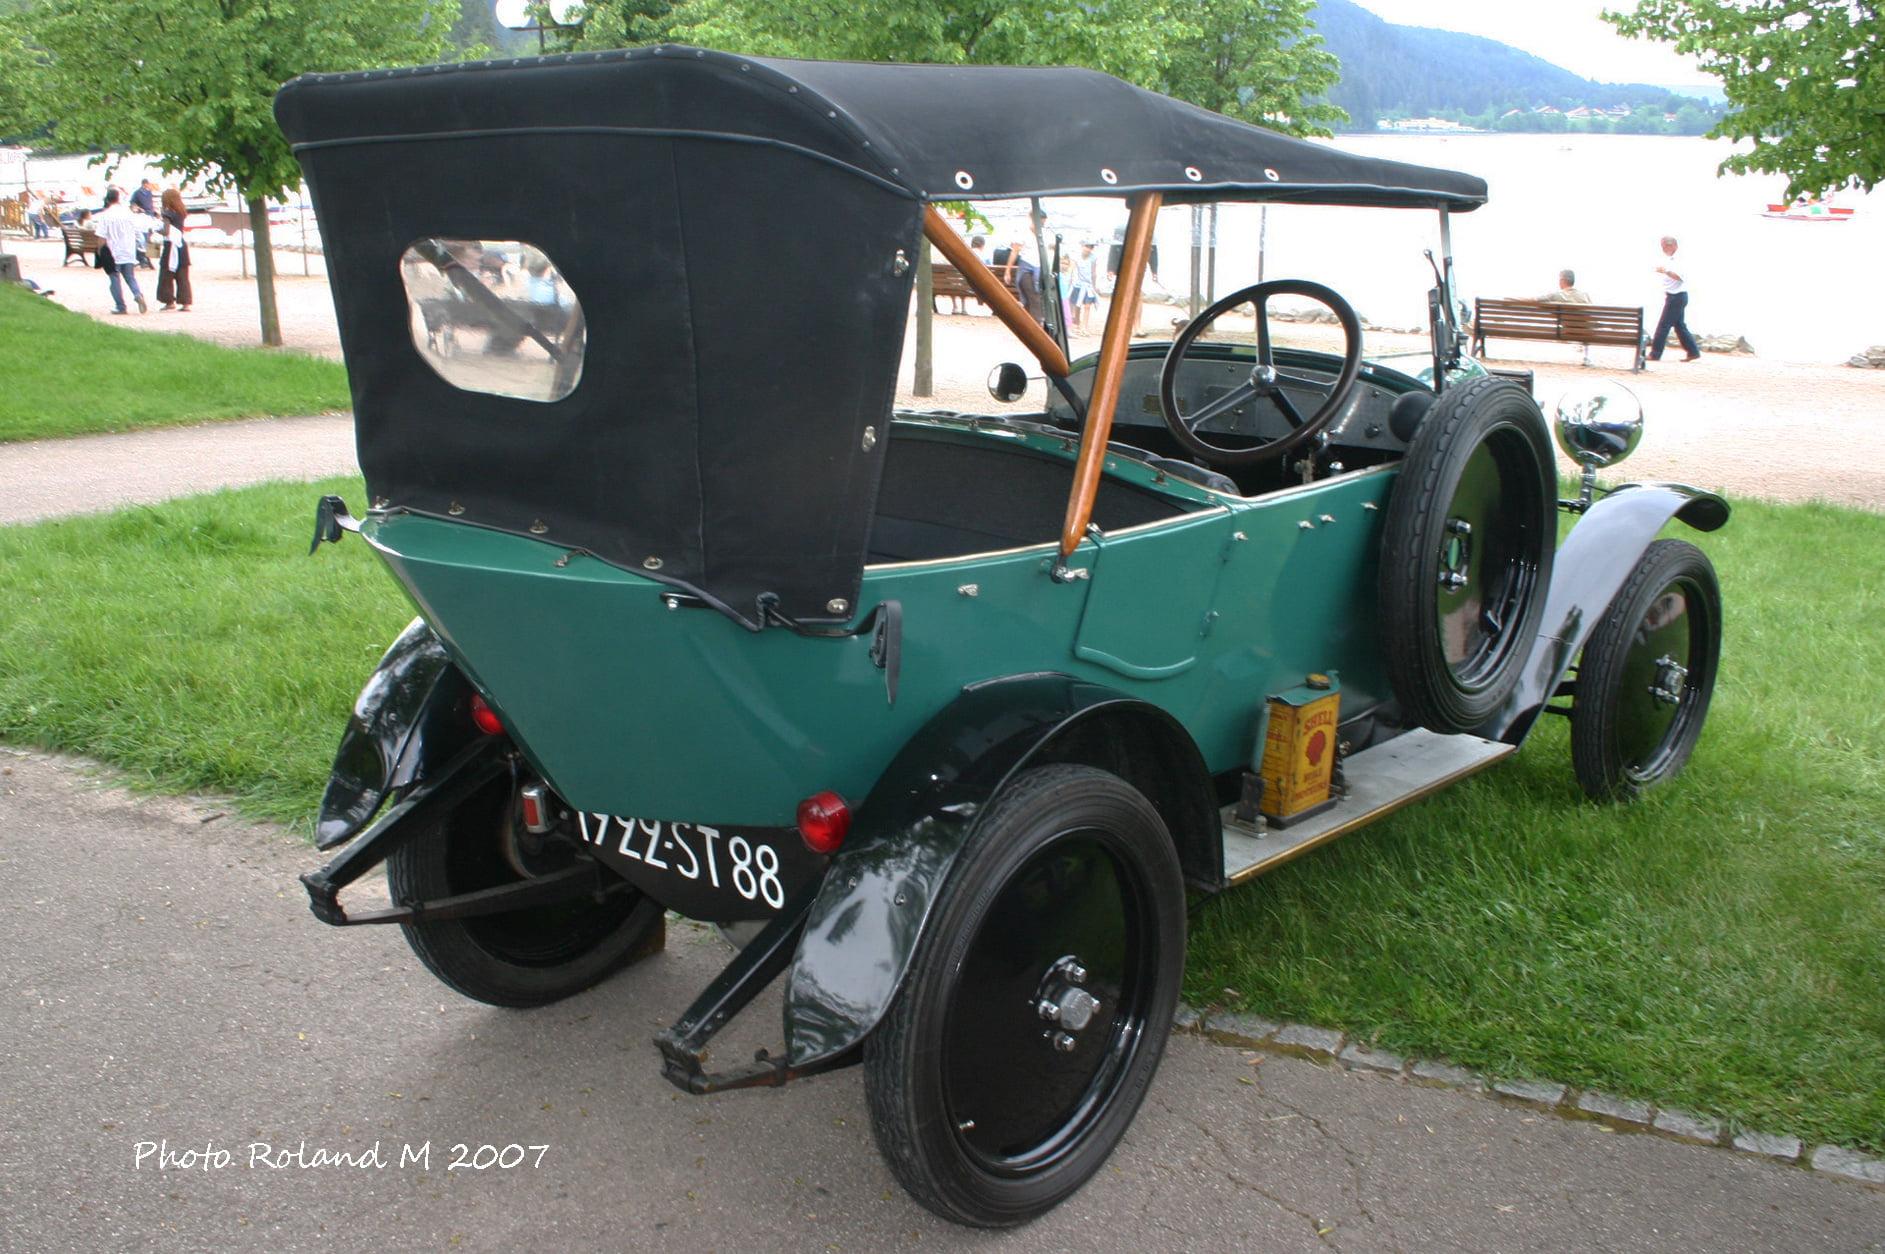 Mathis-type-P-torpedo-1922--Retro-Vosgien-Club-Retro-Vosgien-in-Gerardmer--88--in-2007-(2)